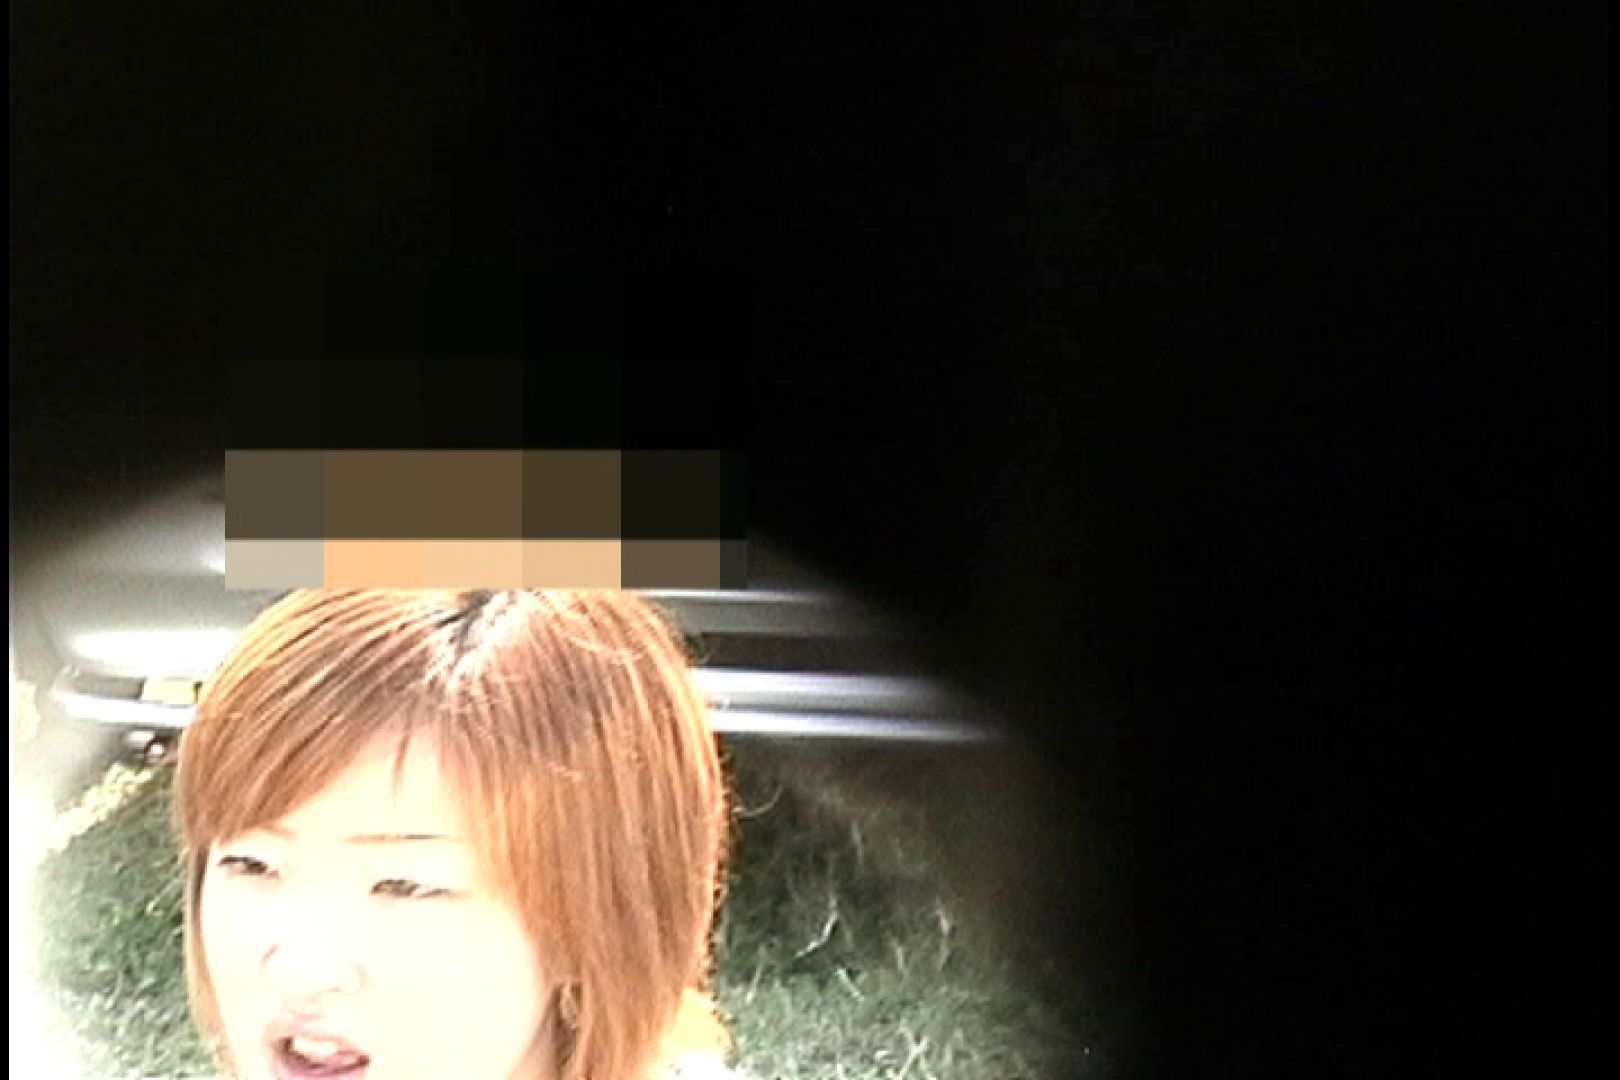 No.41 陰茎から滴り落ちる水滴 接写 オマンコ無修正動画無料 107枚 23